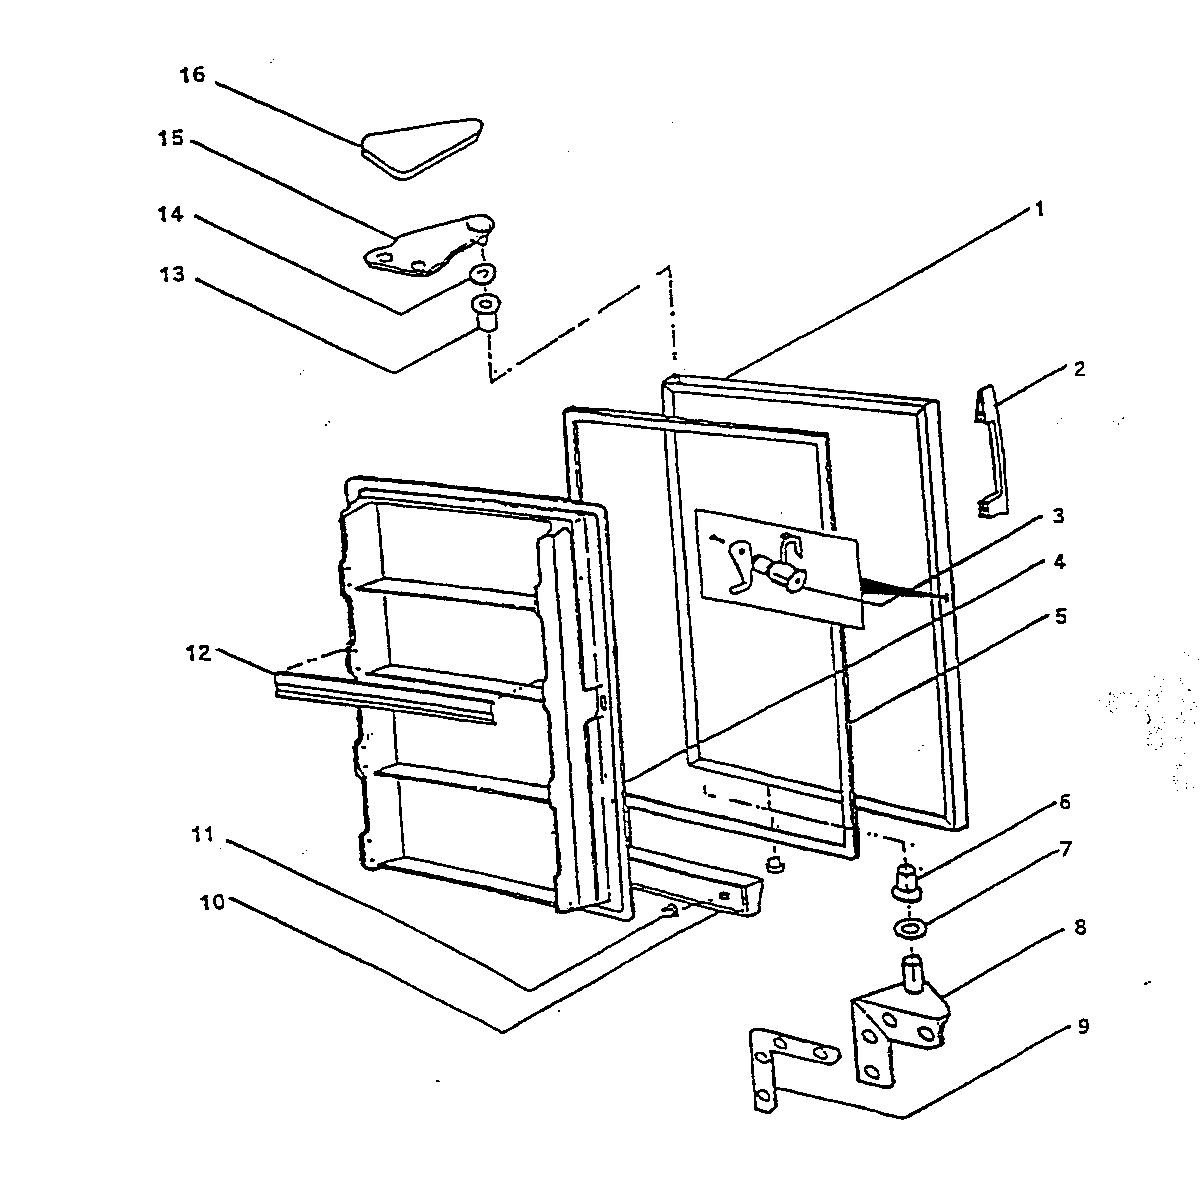 Wc-Wood model V20NAB upright freezer genuine parts